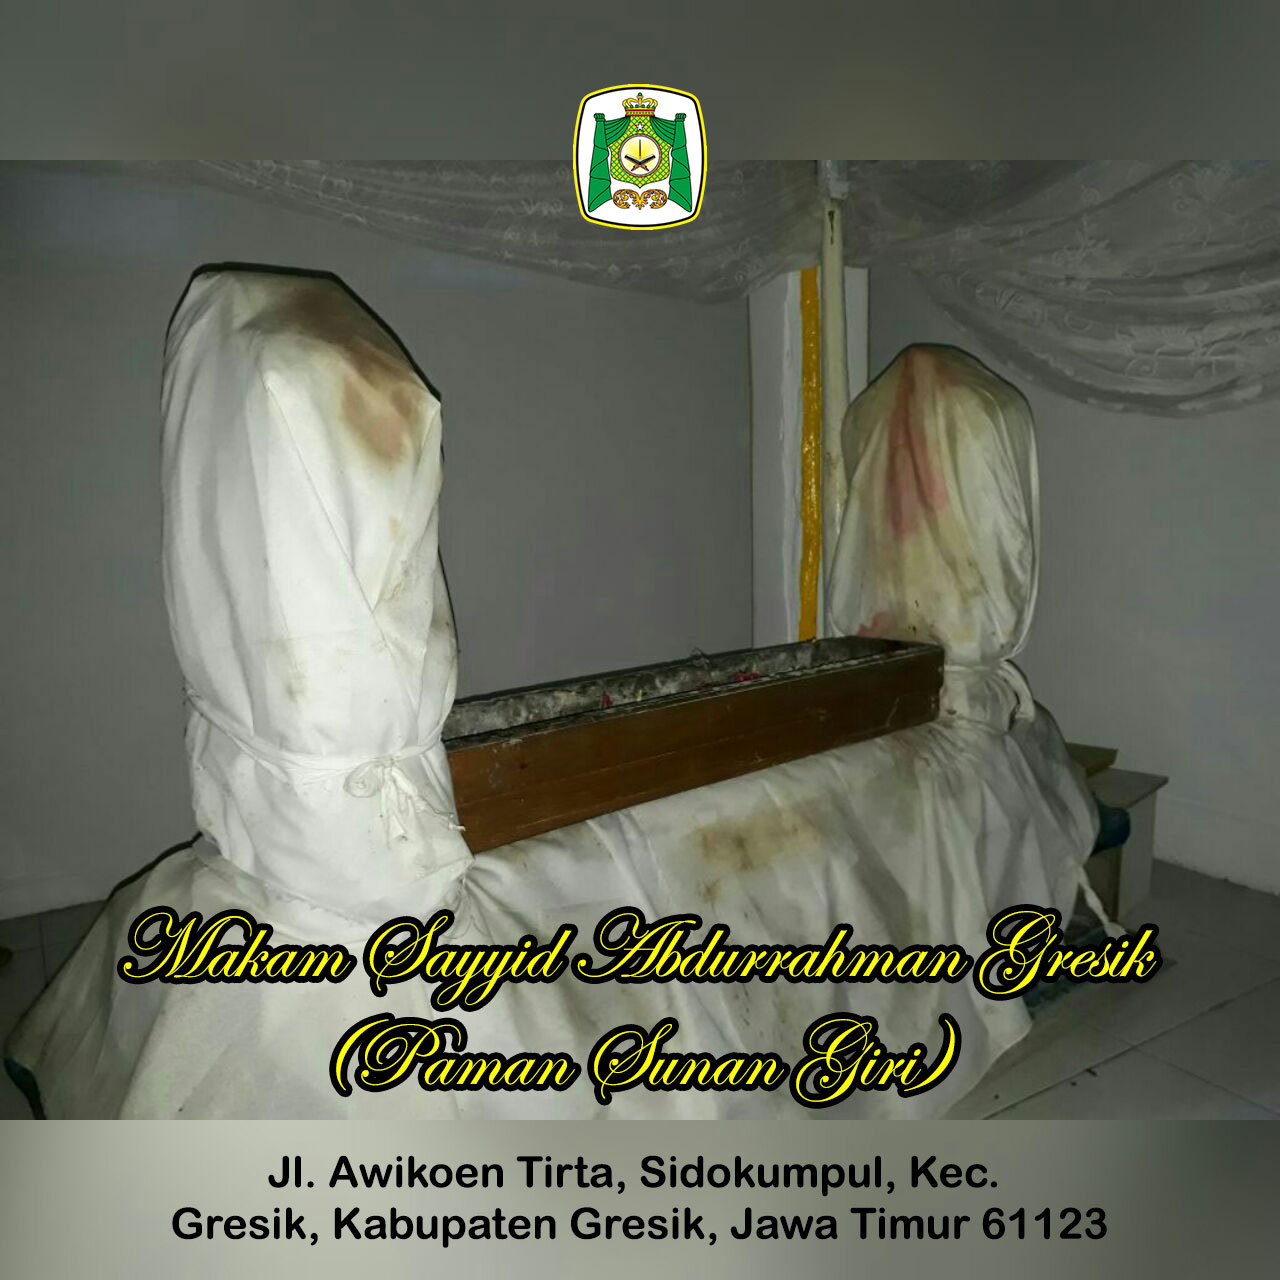 September 2017 Almunawwarah Trans Makam Sayyid Abdurrahman Gresik Situs Giri